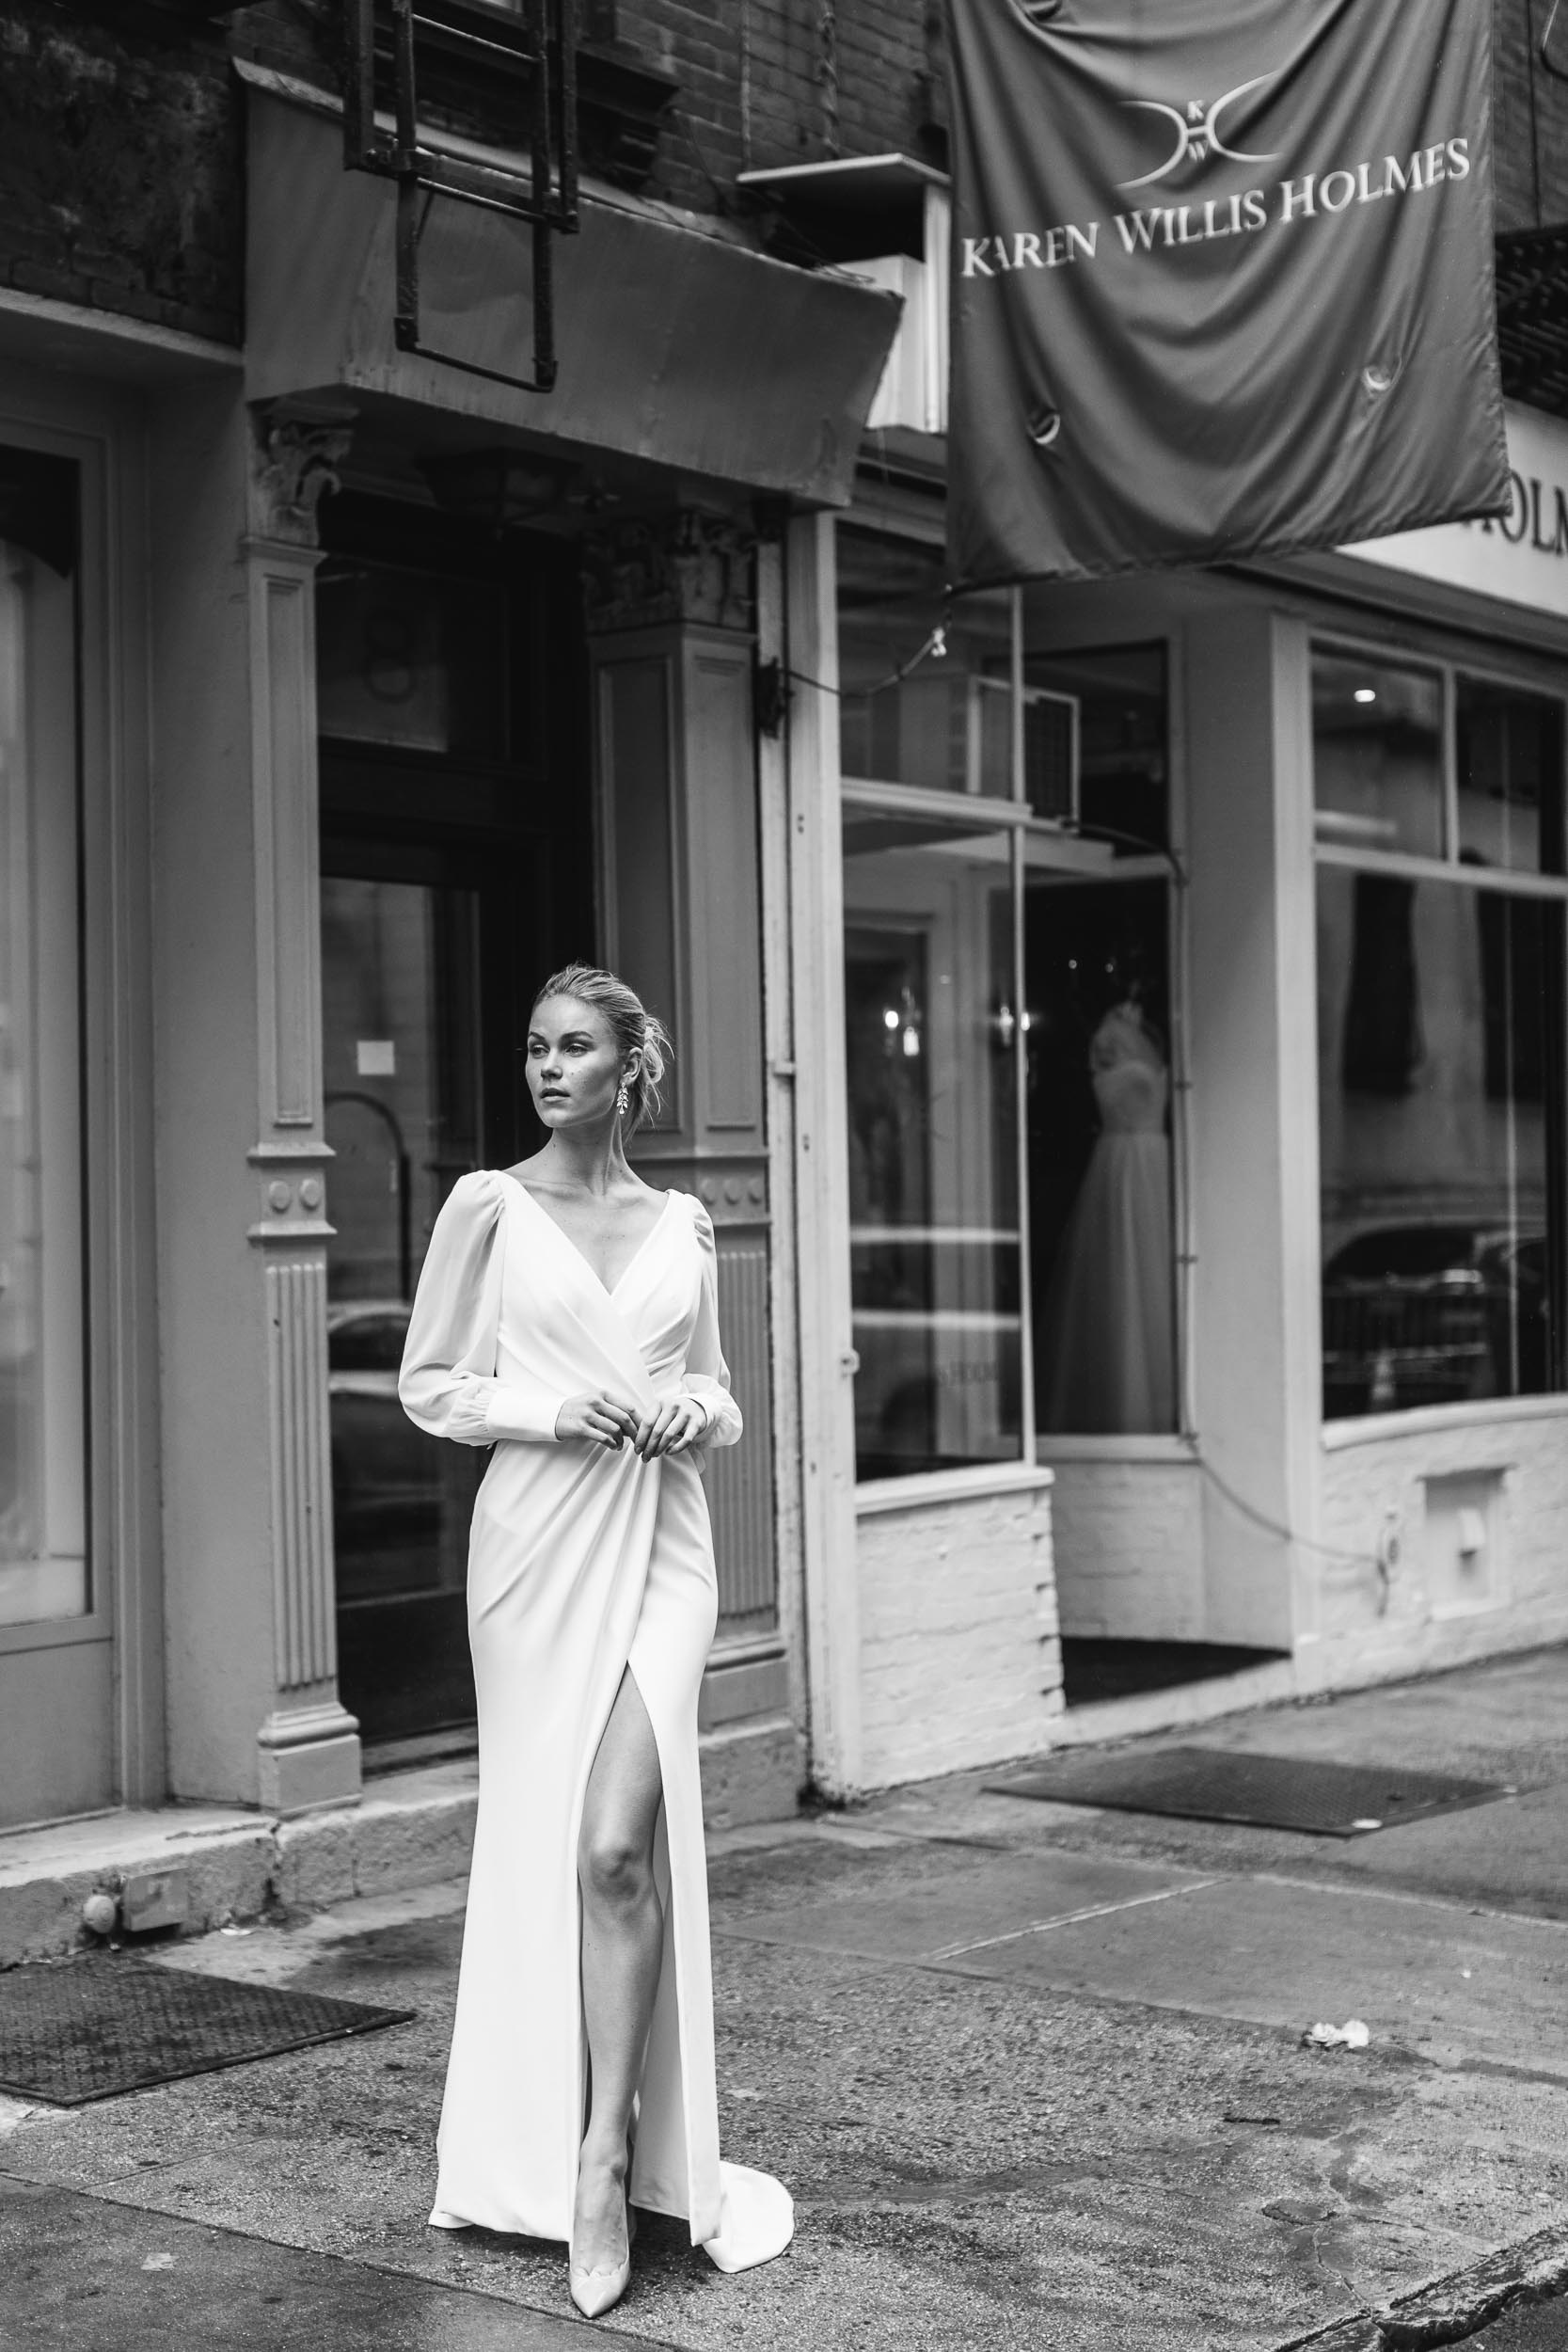 Kas-Richards-New-York-City-Wedding-Karen-Willis_Holmes-110.jpg